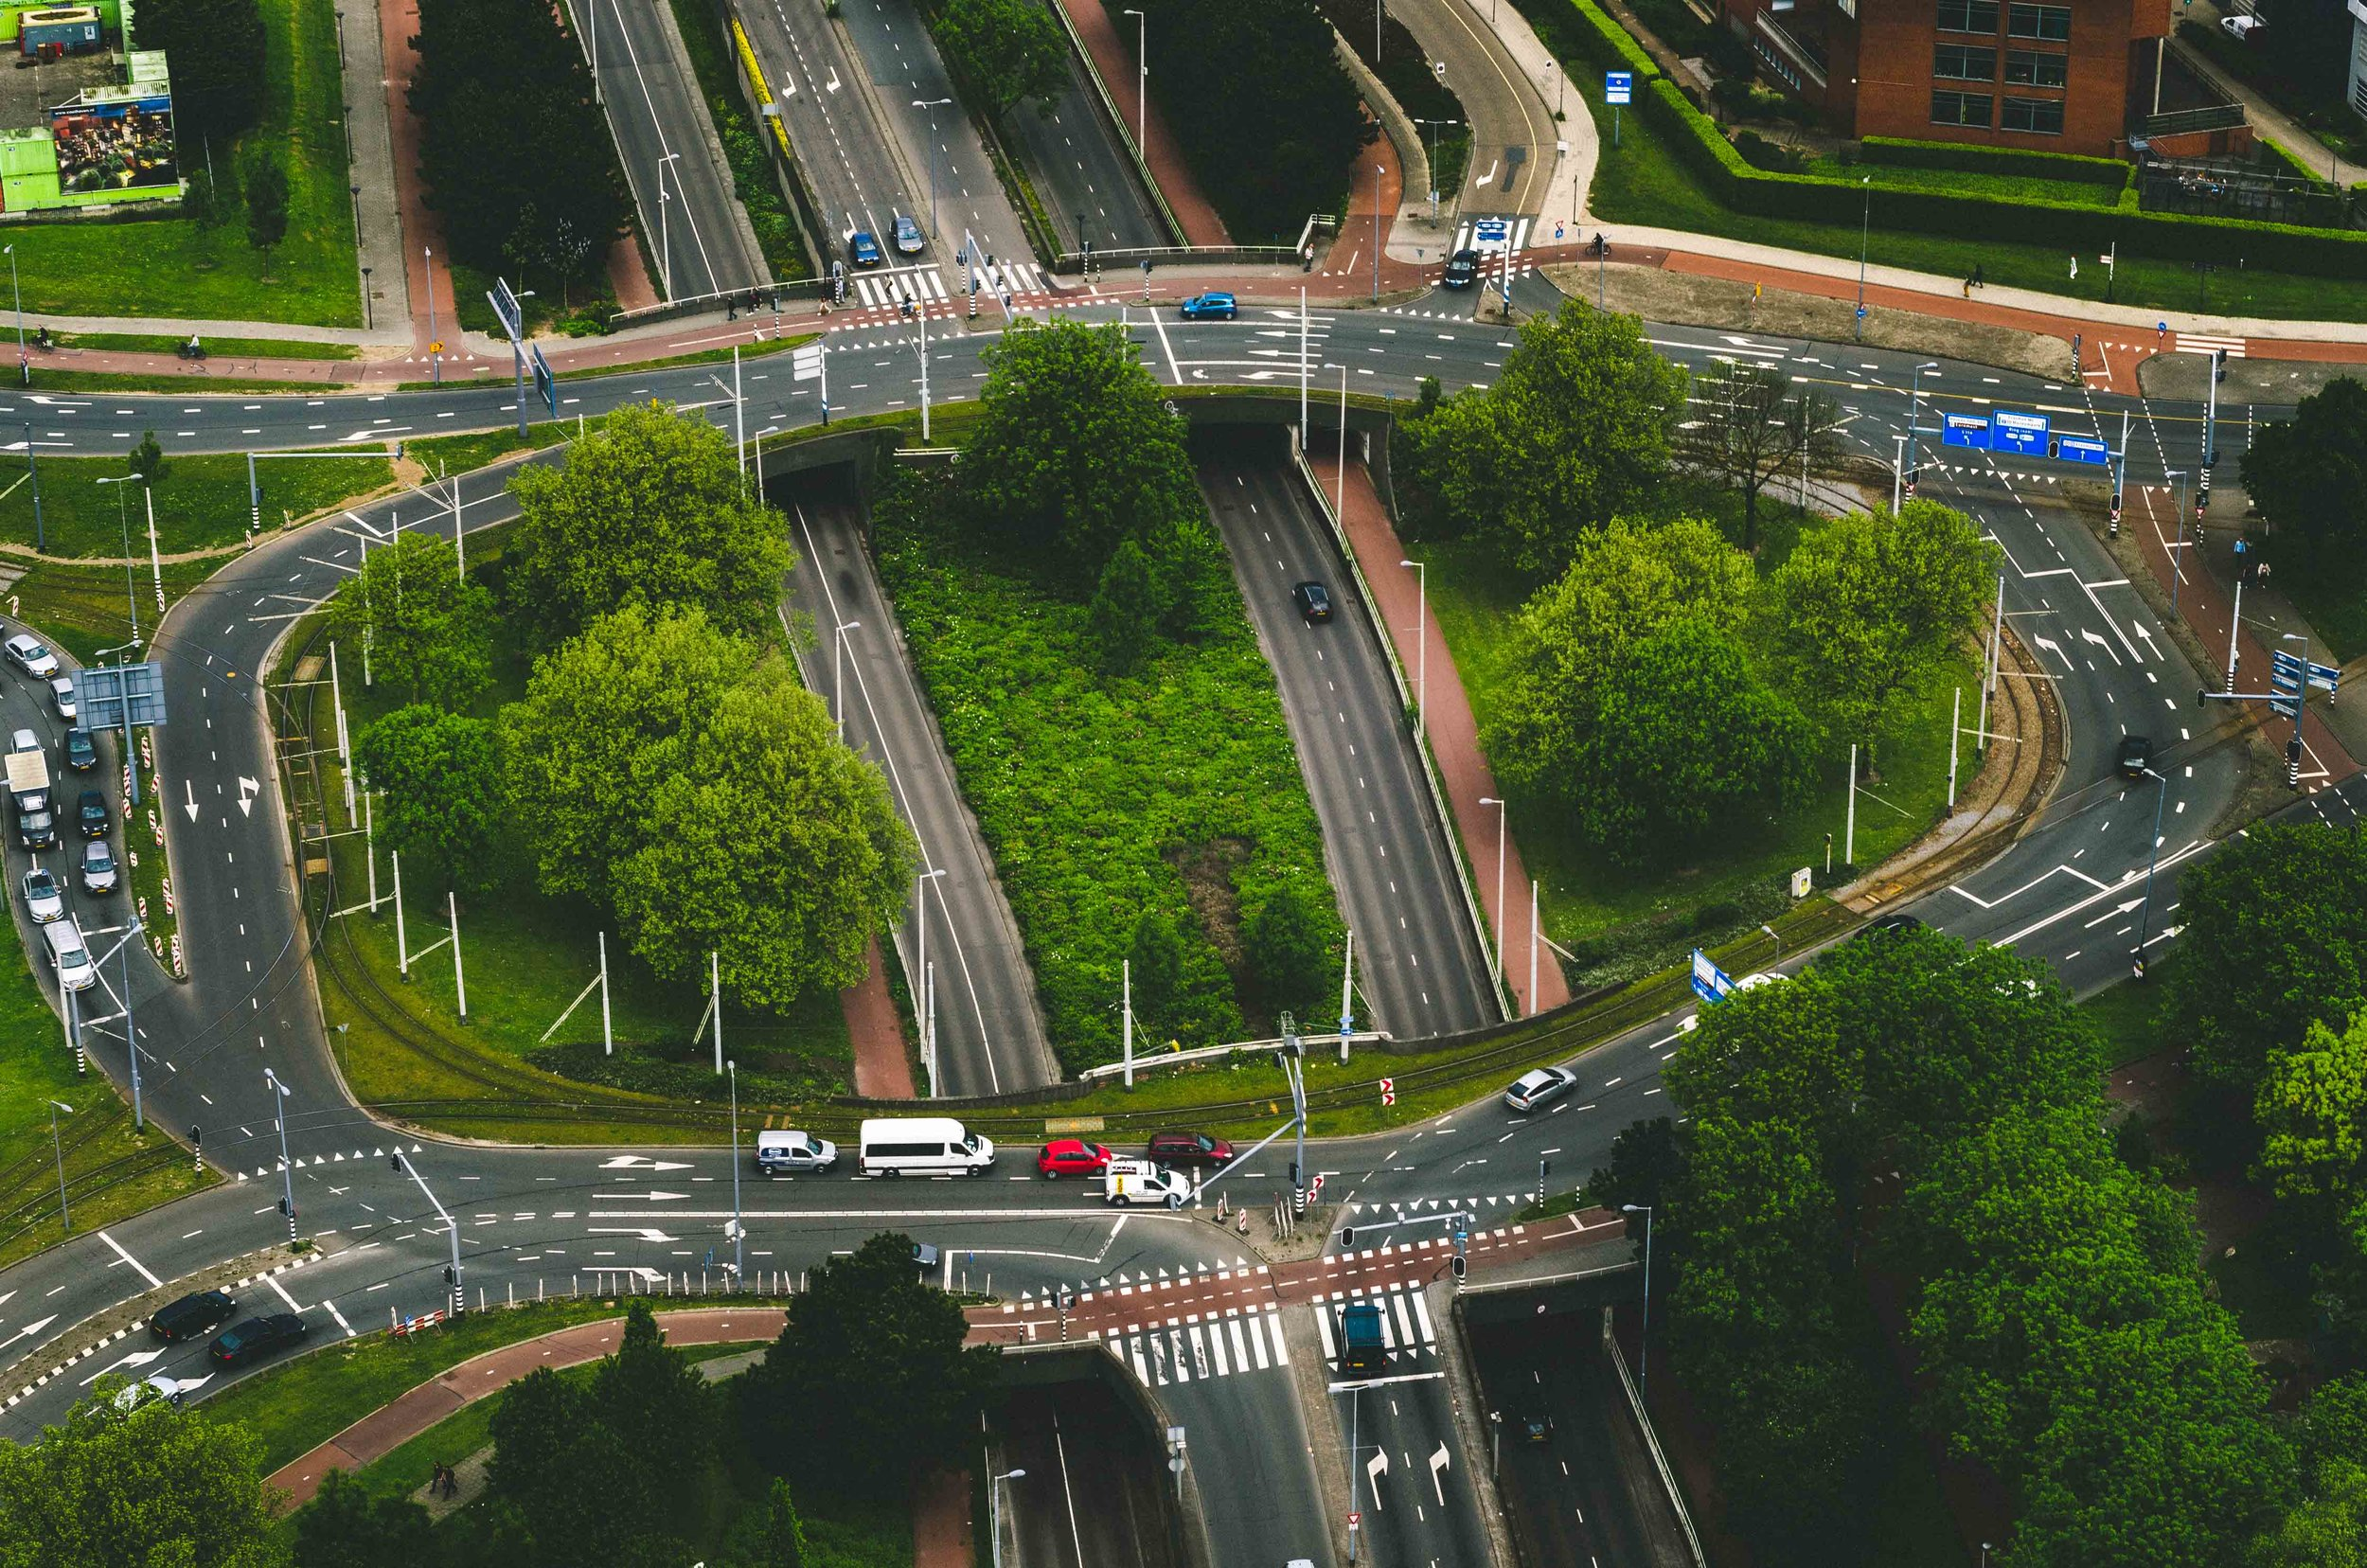 Westzeedijk roundabout/intersection